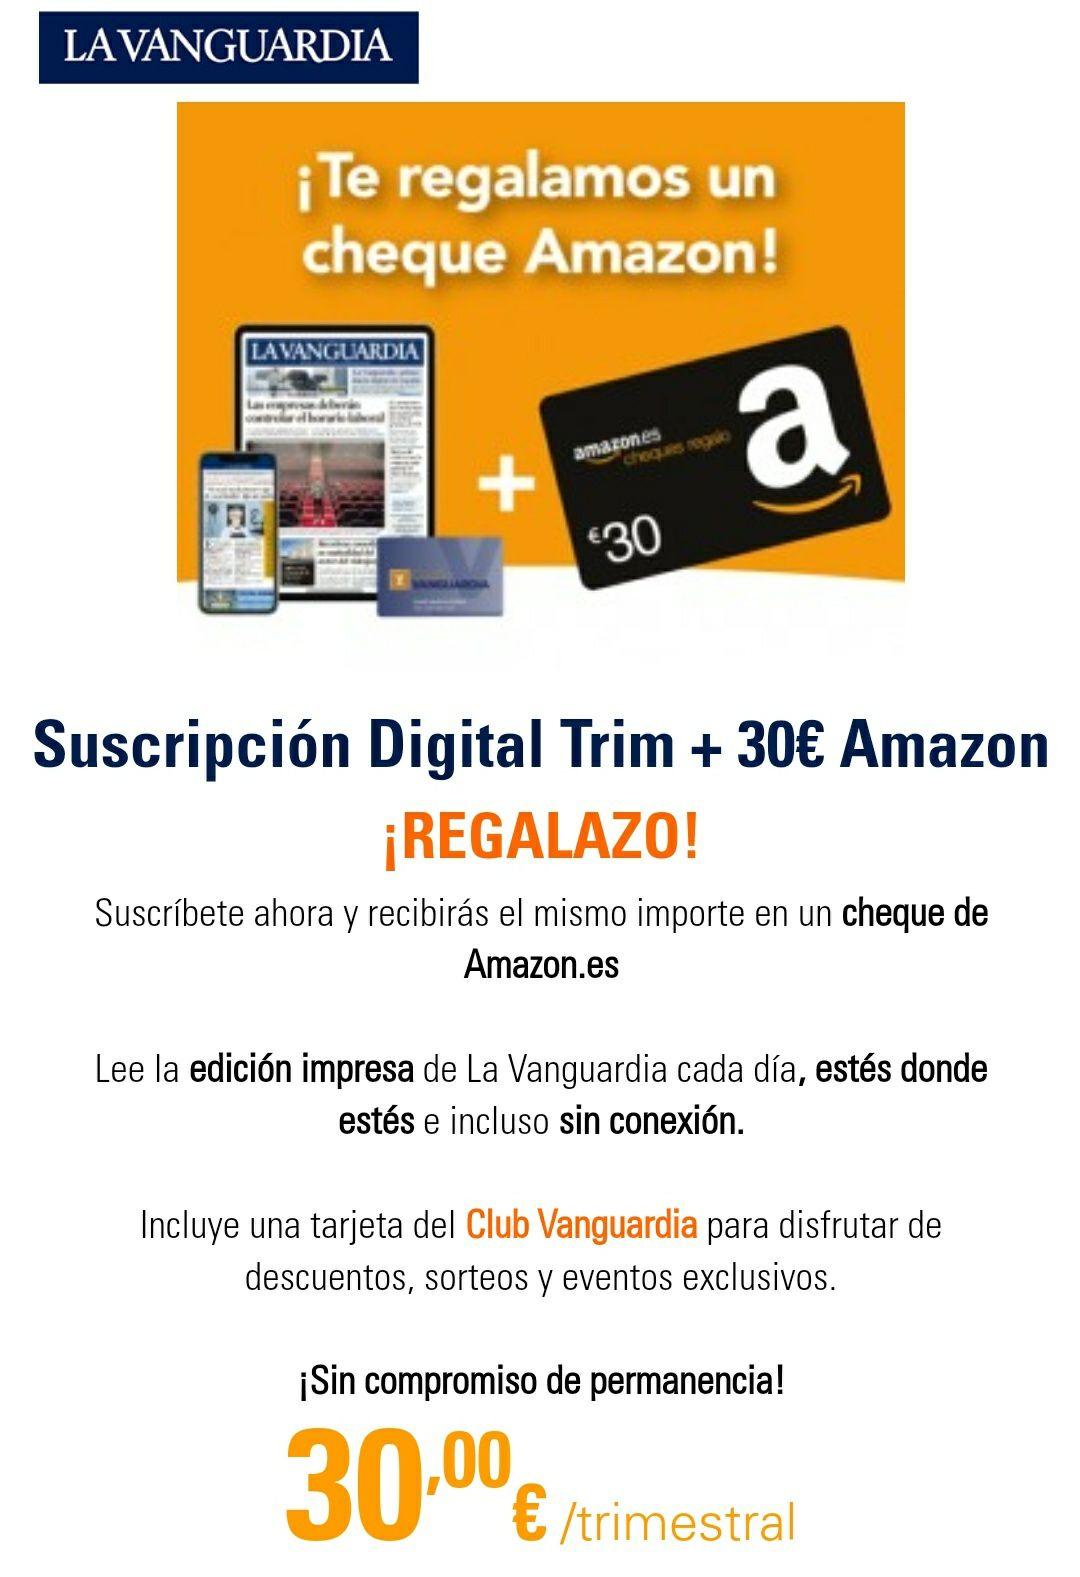 Cheque regalo Amazon 30€ La Vanguardia